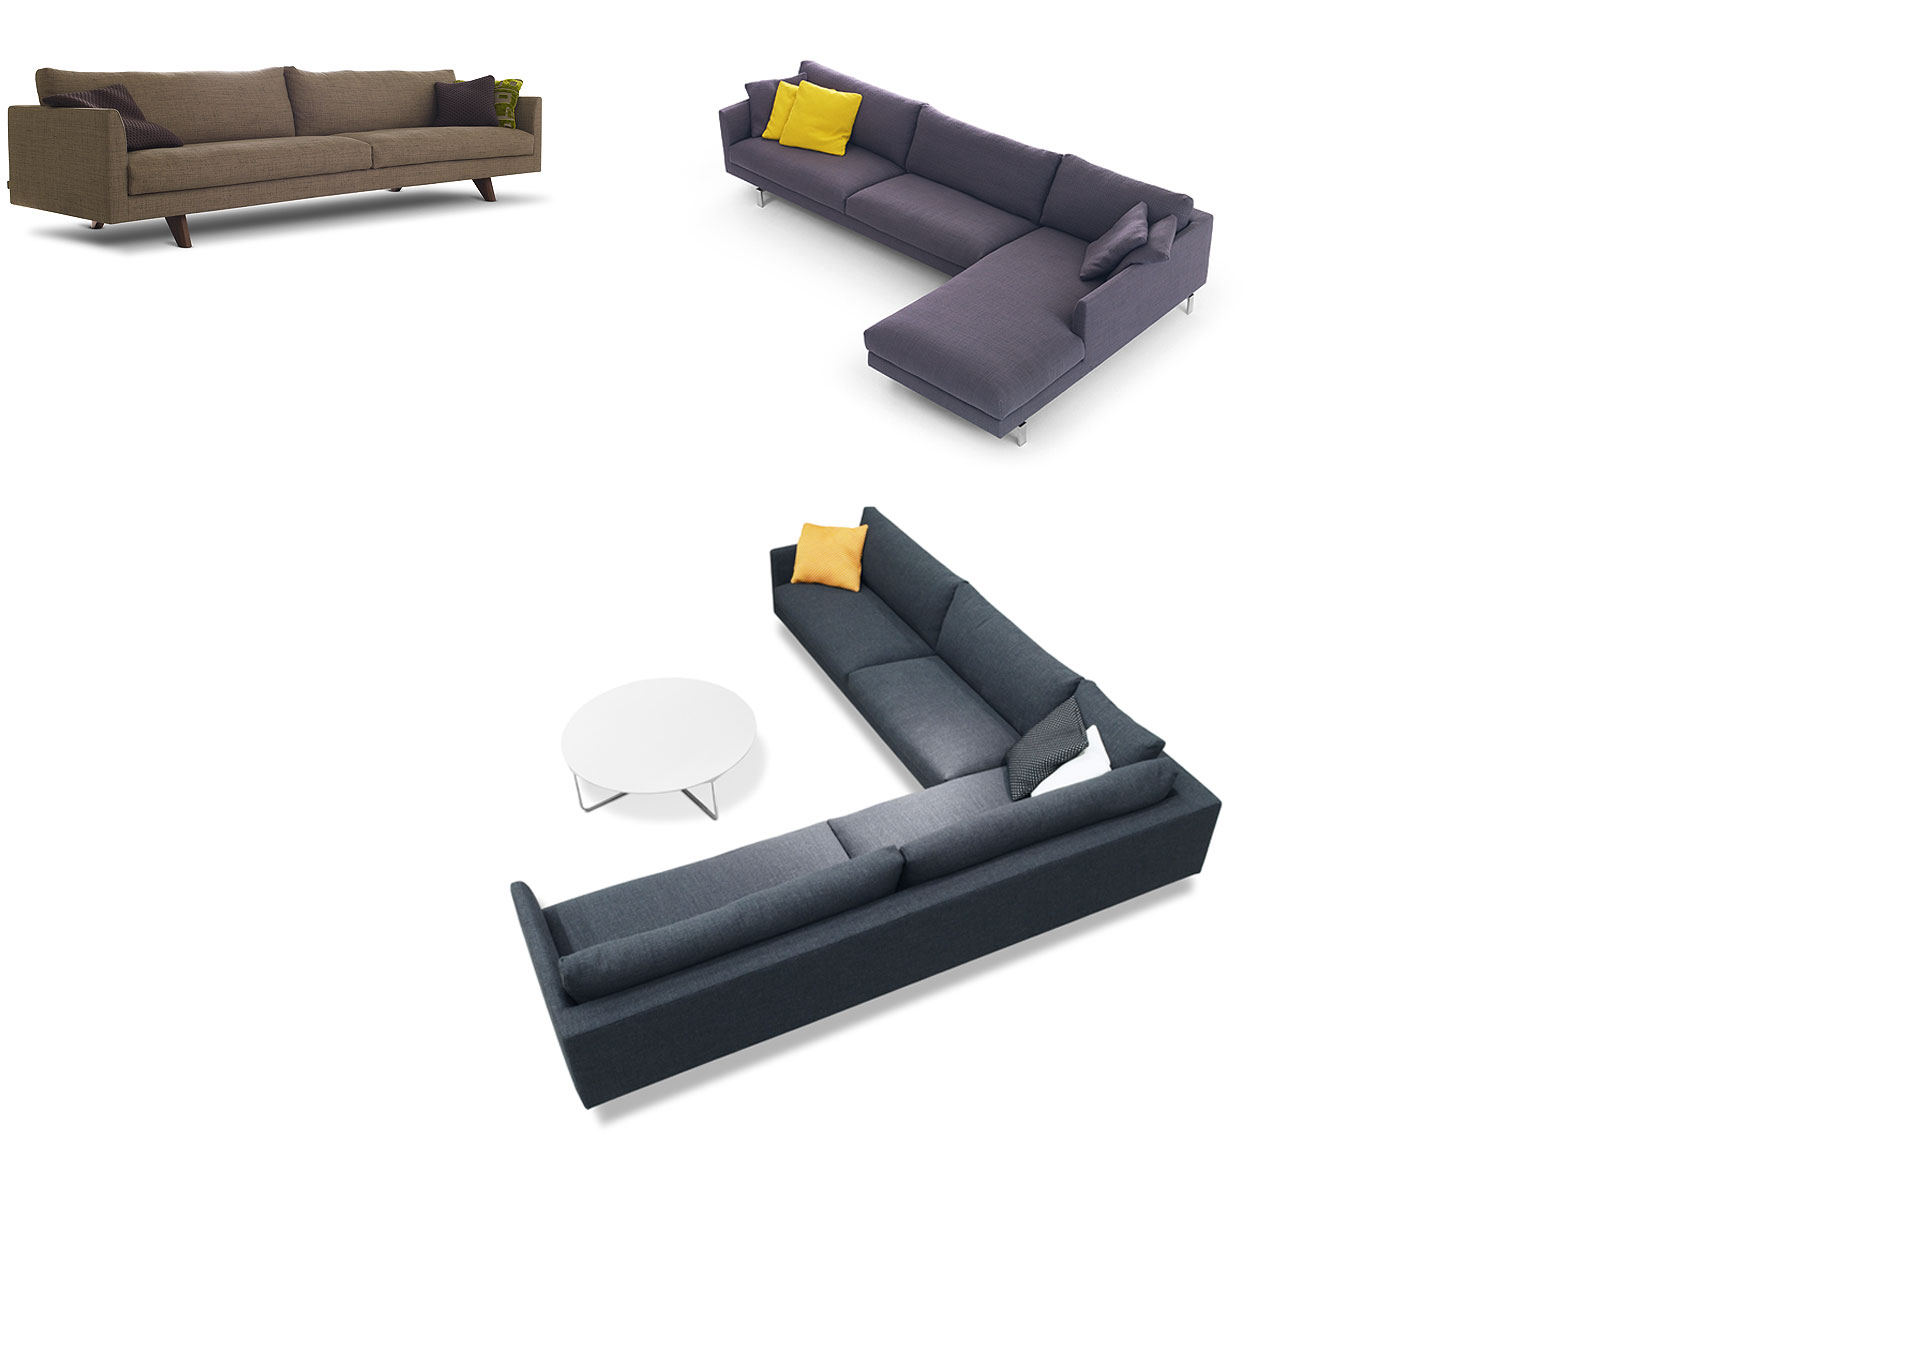 montis sofa kaufen. Black Bedroom Furniture Sets. Home Design Ideas